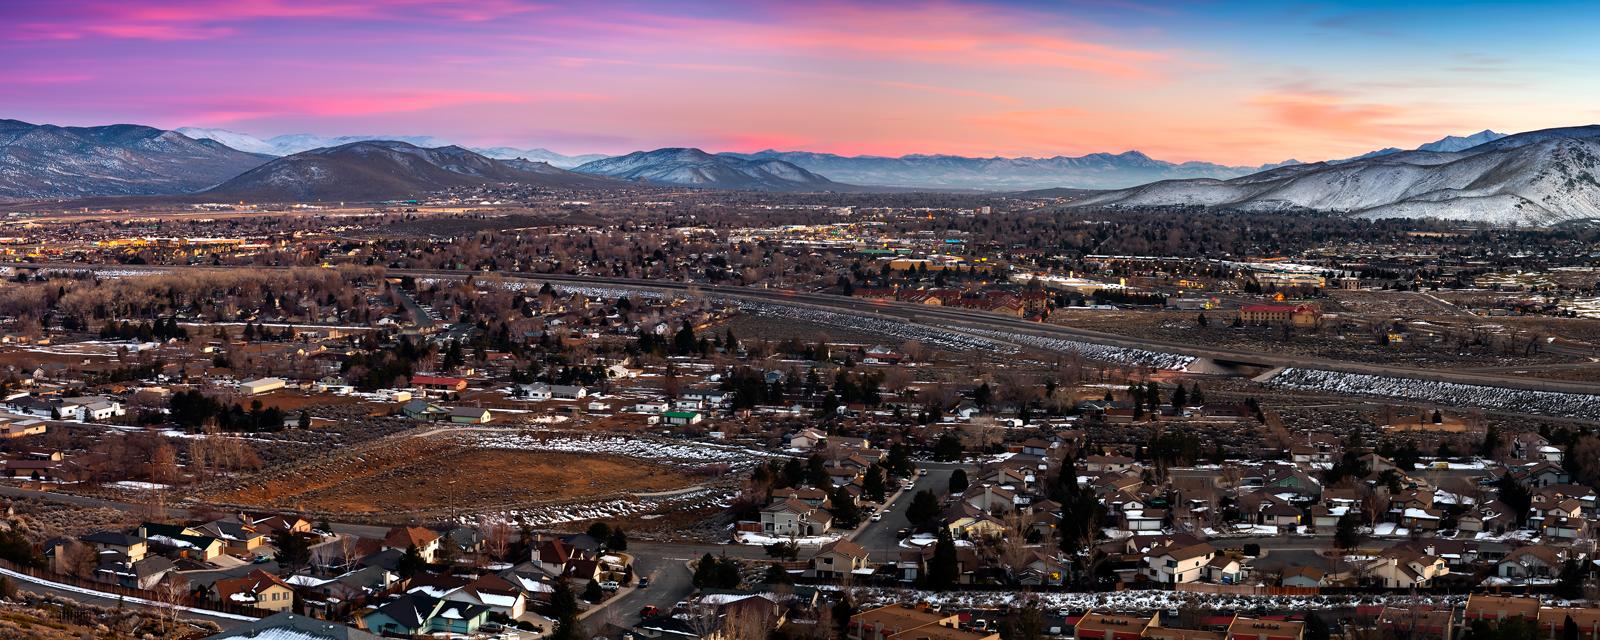 Carson City Nv Chase International Luxury Real Estate Tahoe Reno